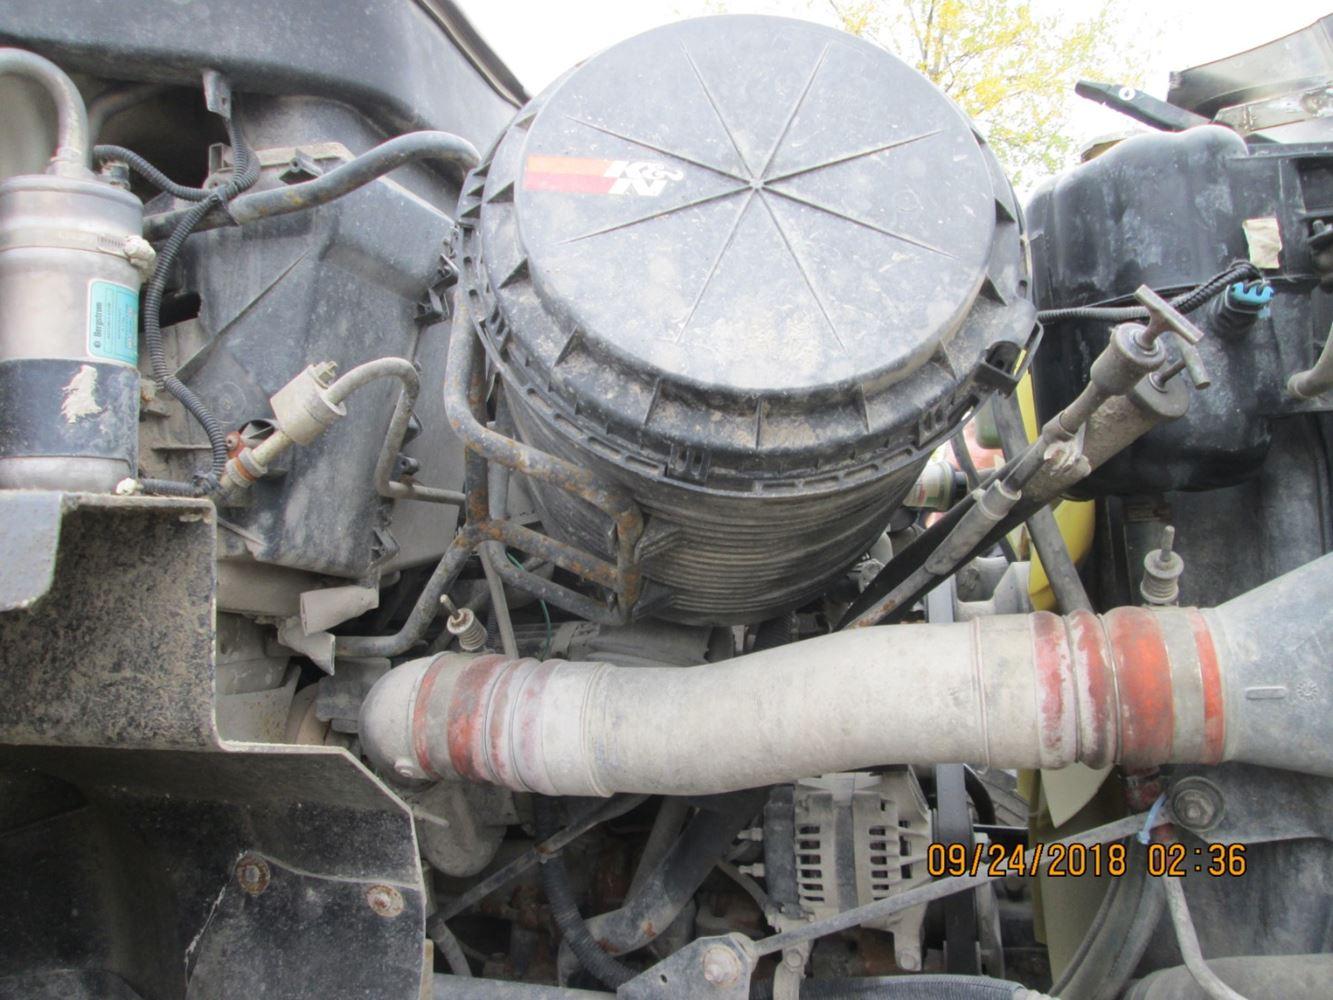 2005 Cummins M11 / ISM 10 8 (Stock #770-3468-1) | Engine